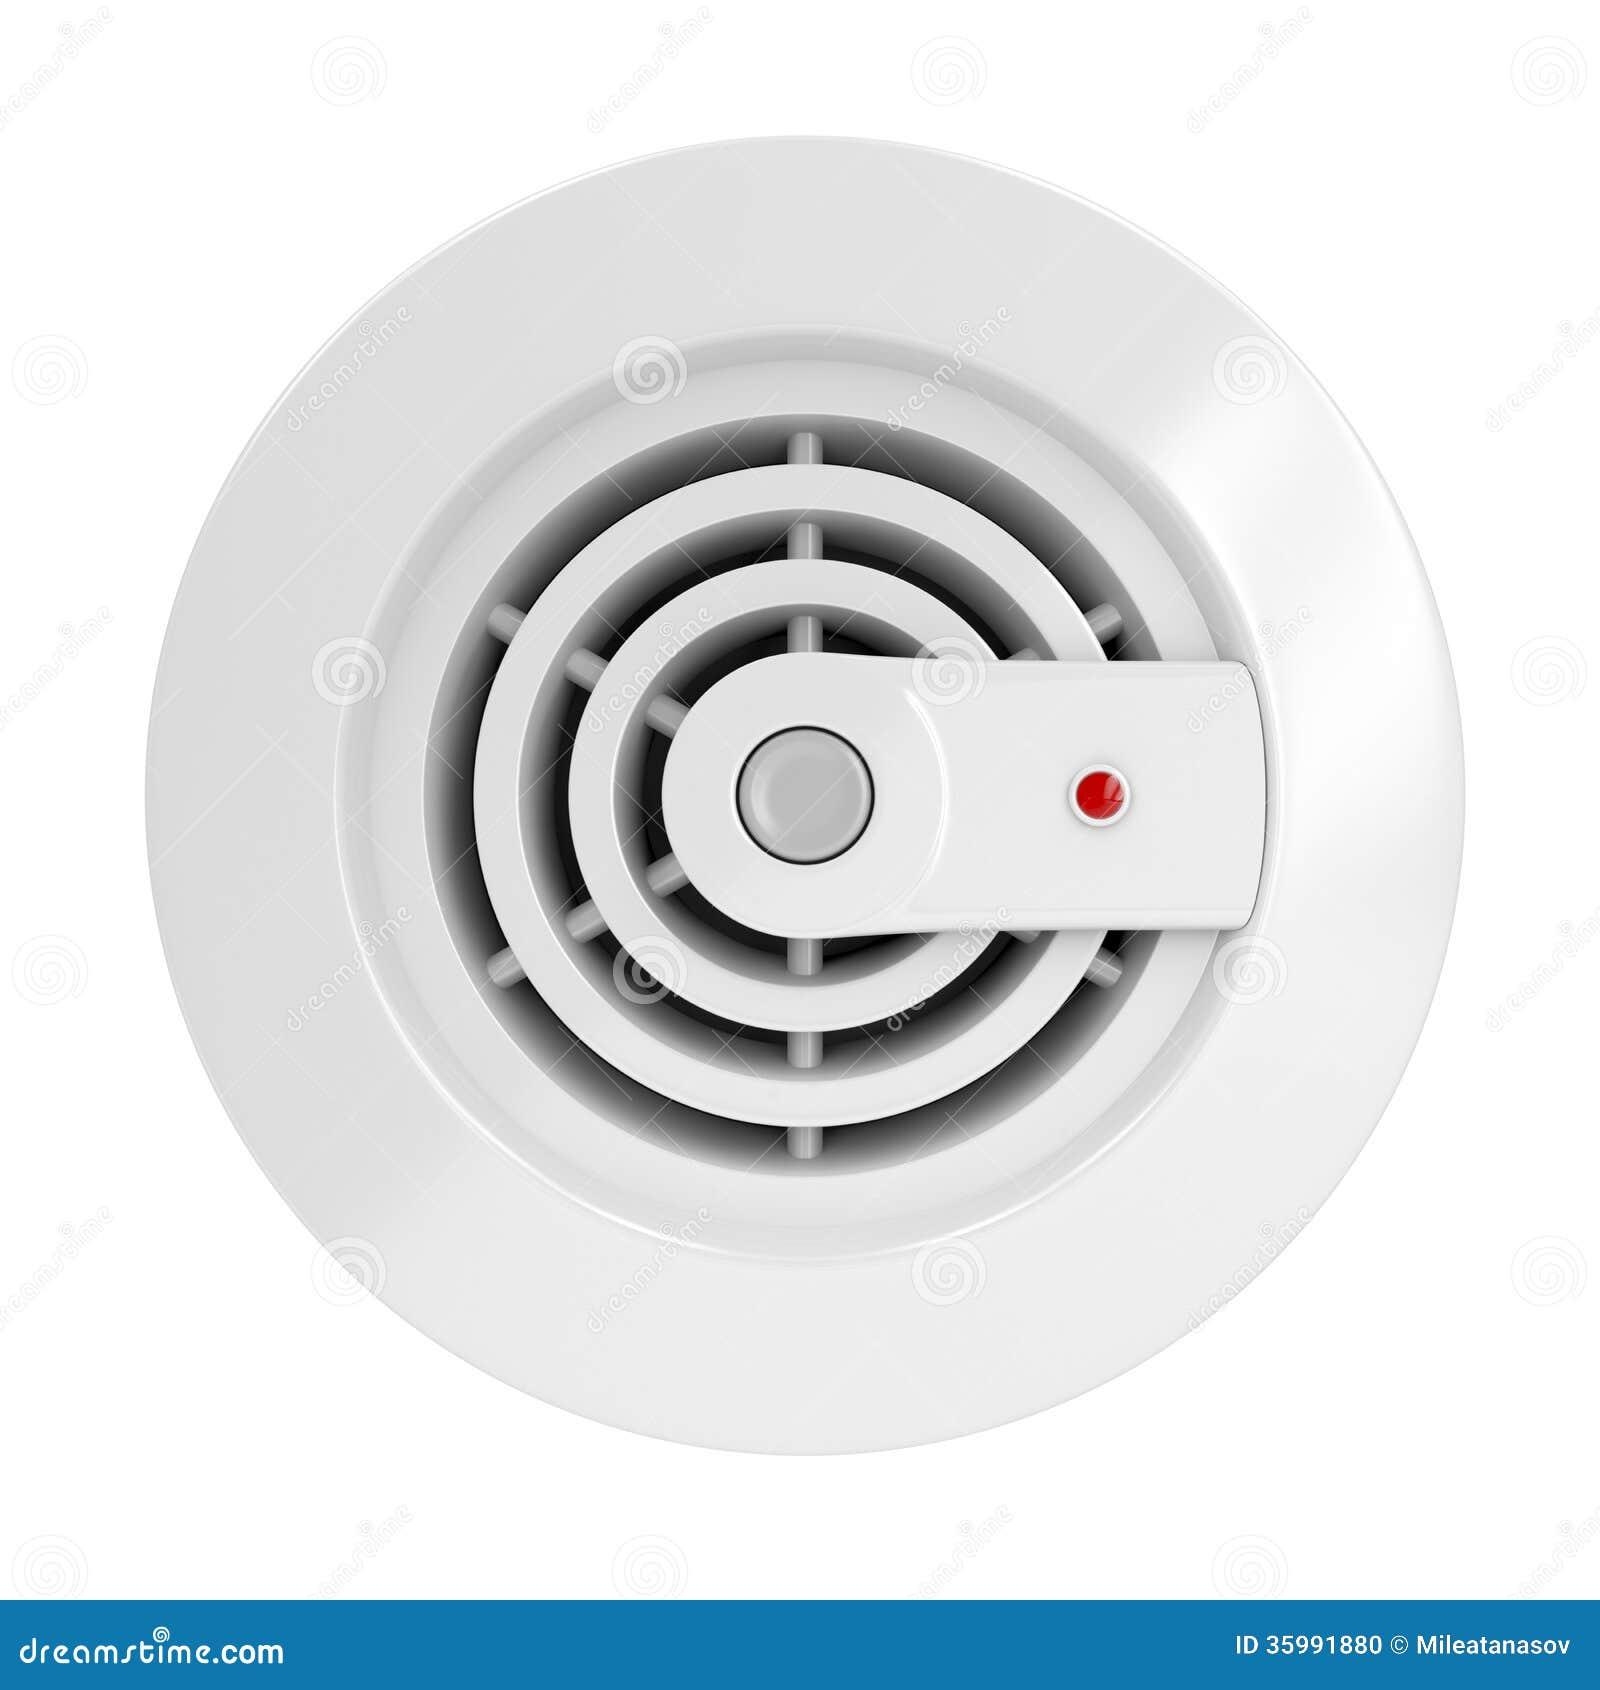 Cartoon Smoke Detector Smoke and fire detector stock